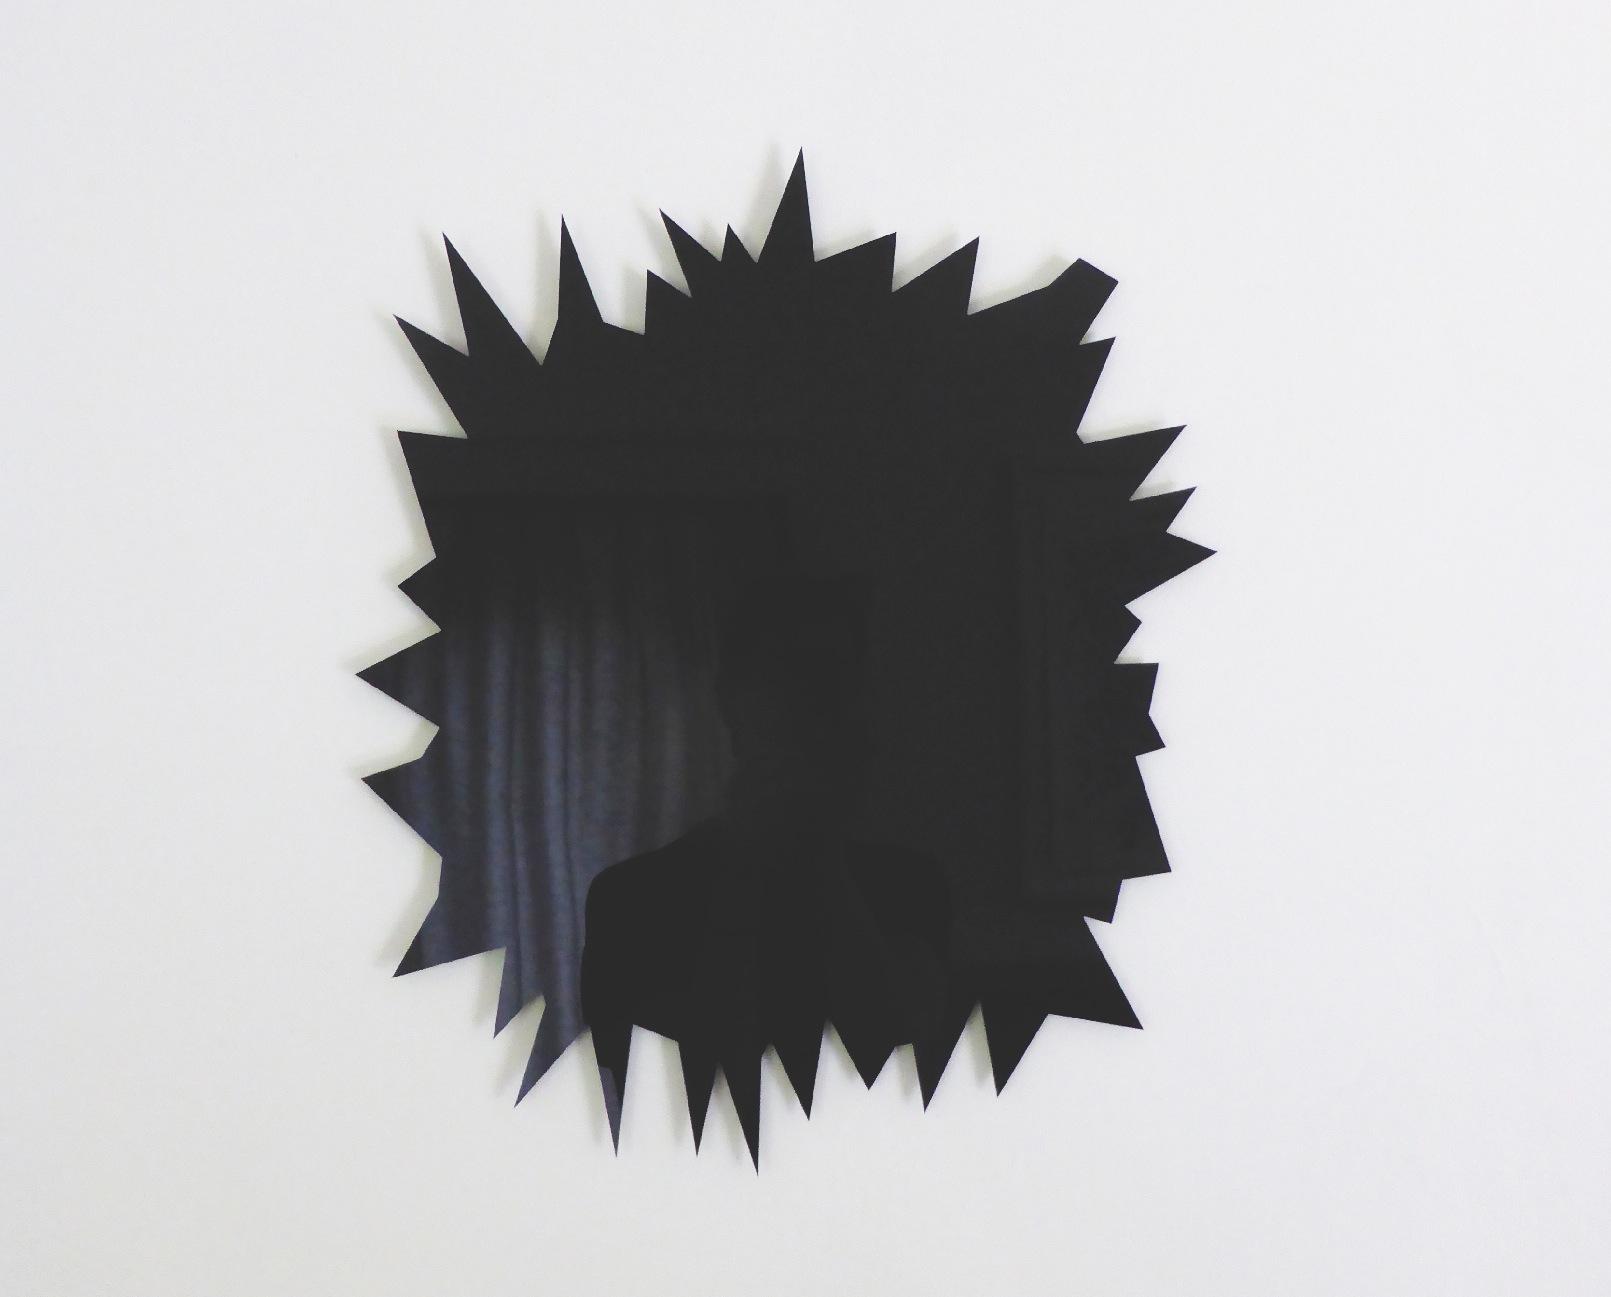 Black Mirrors